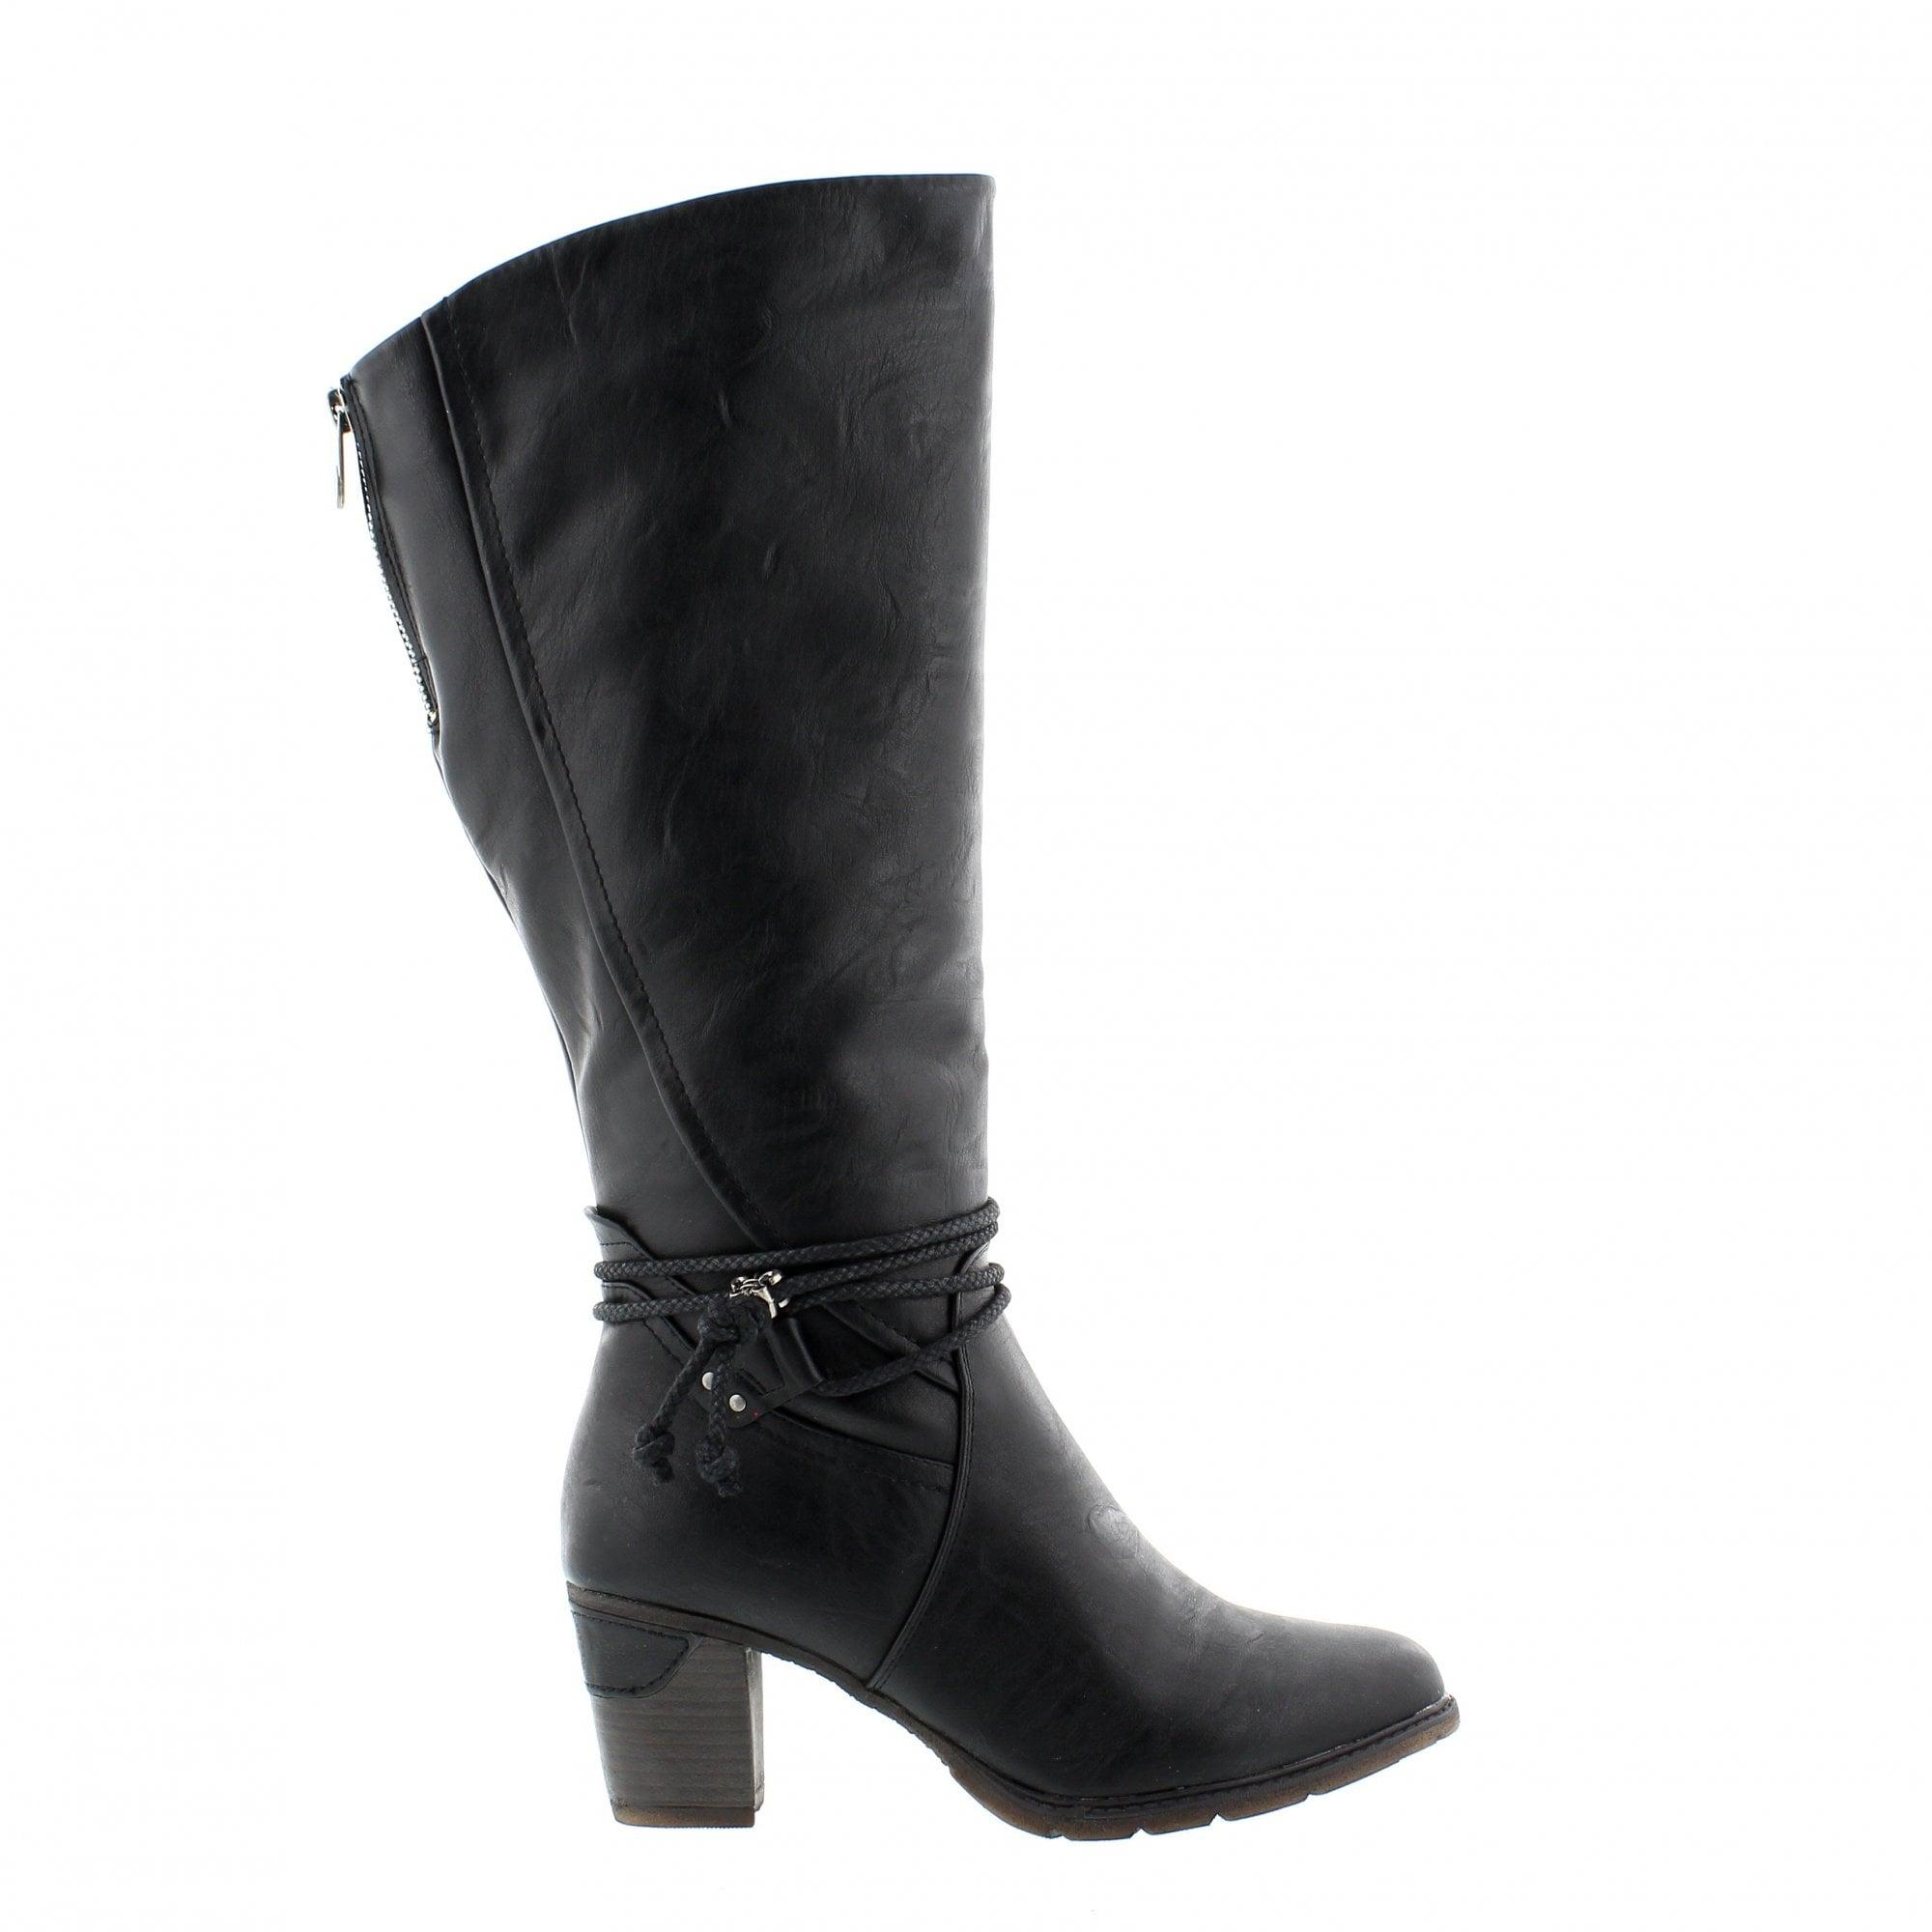 Rieker 96059-00 Black Womens Knee High